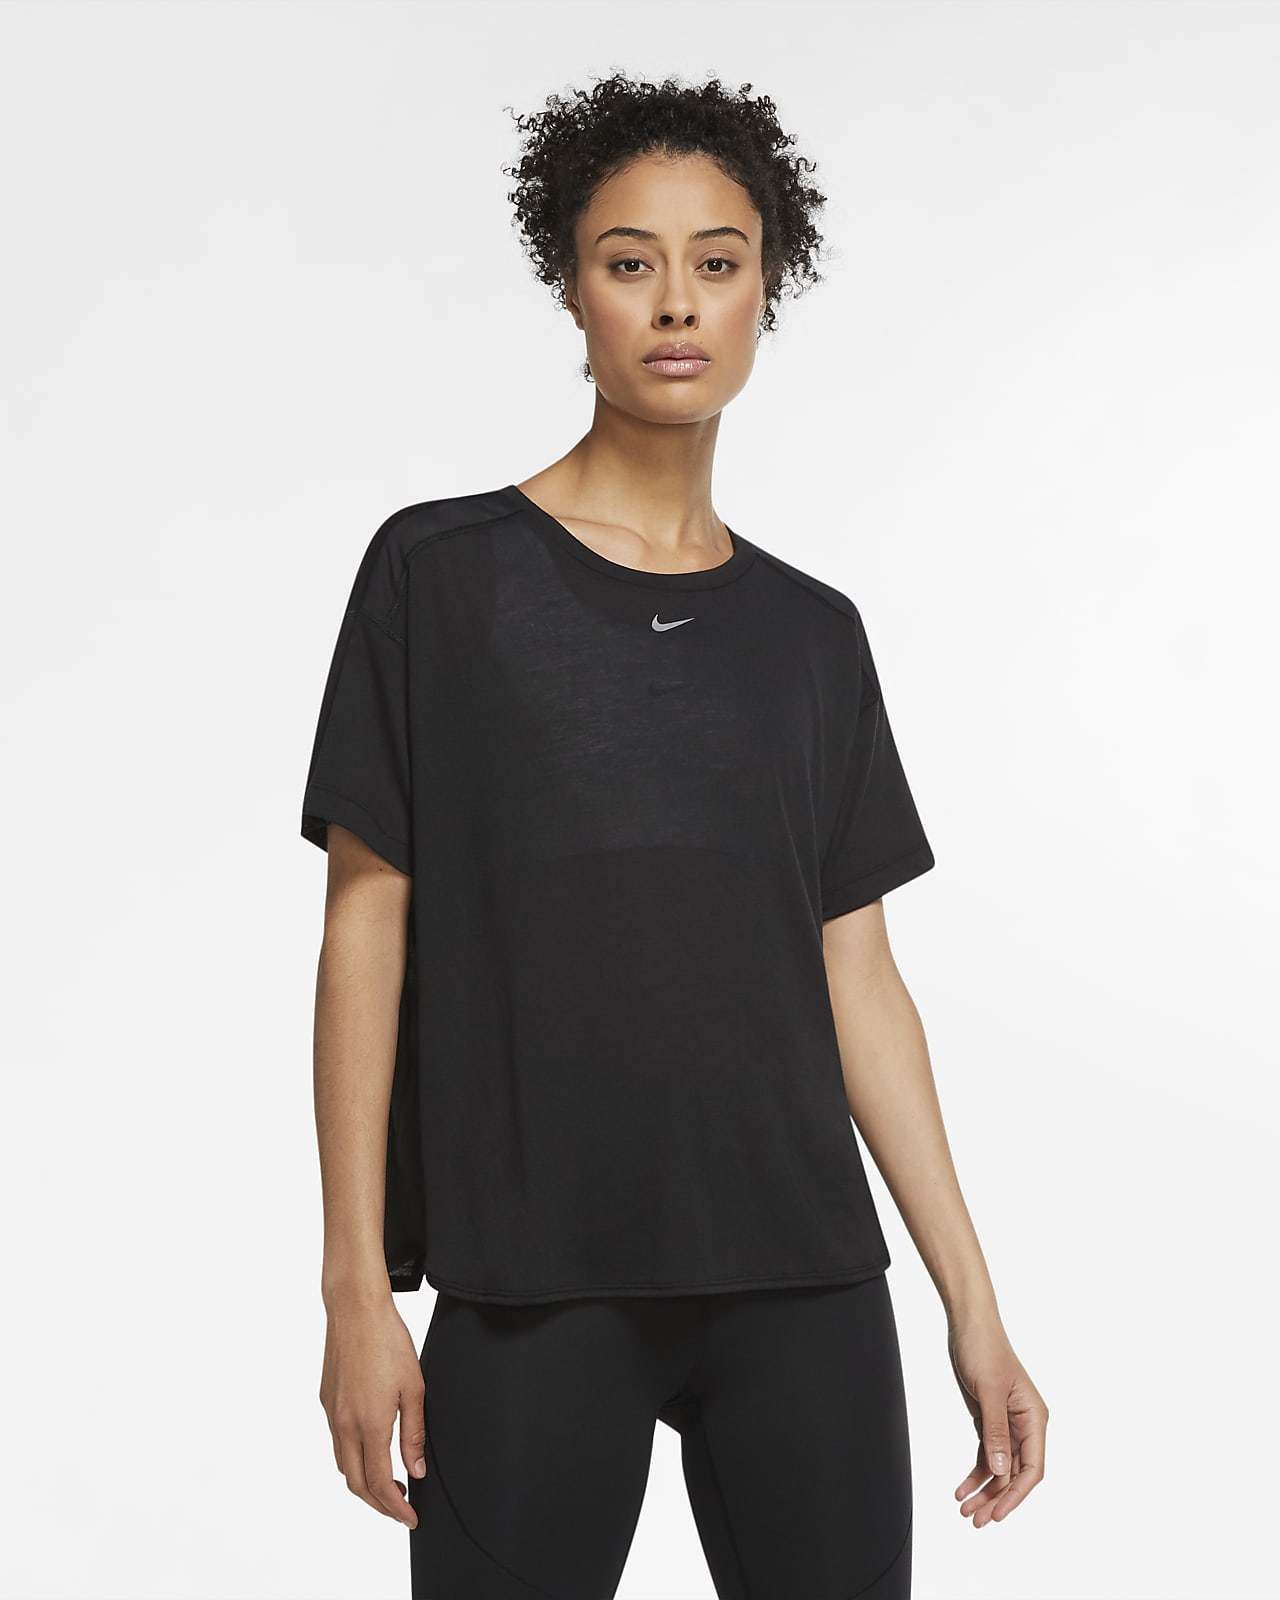 Camisola de manga curta Nike Pro AeroAdapt para mulher